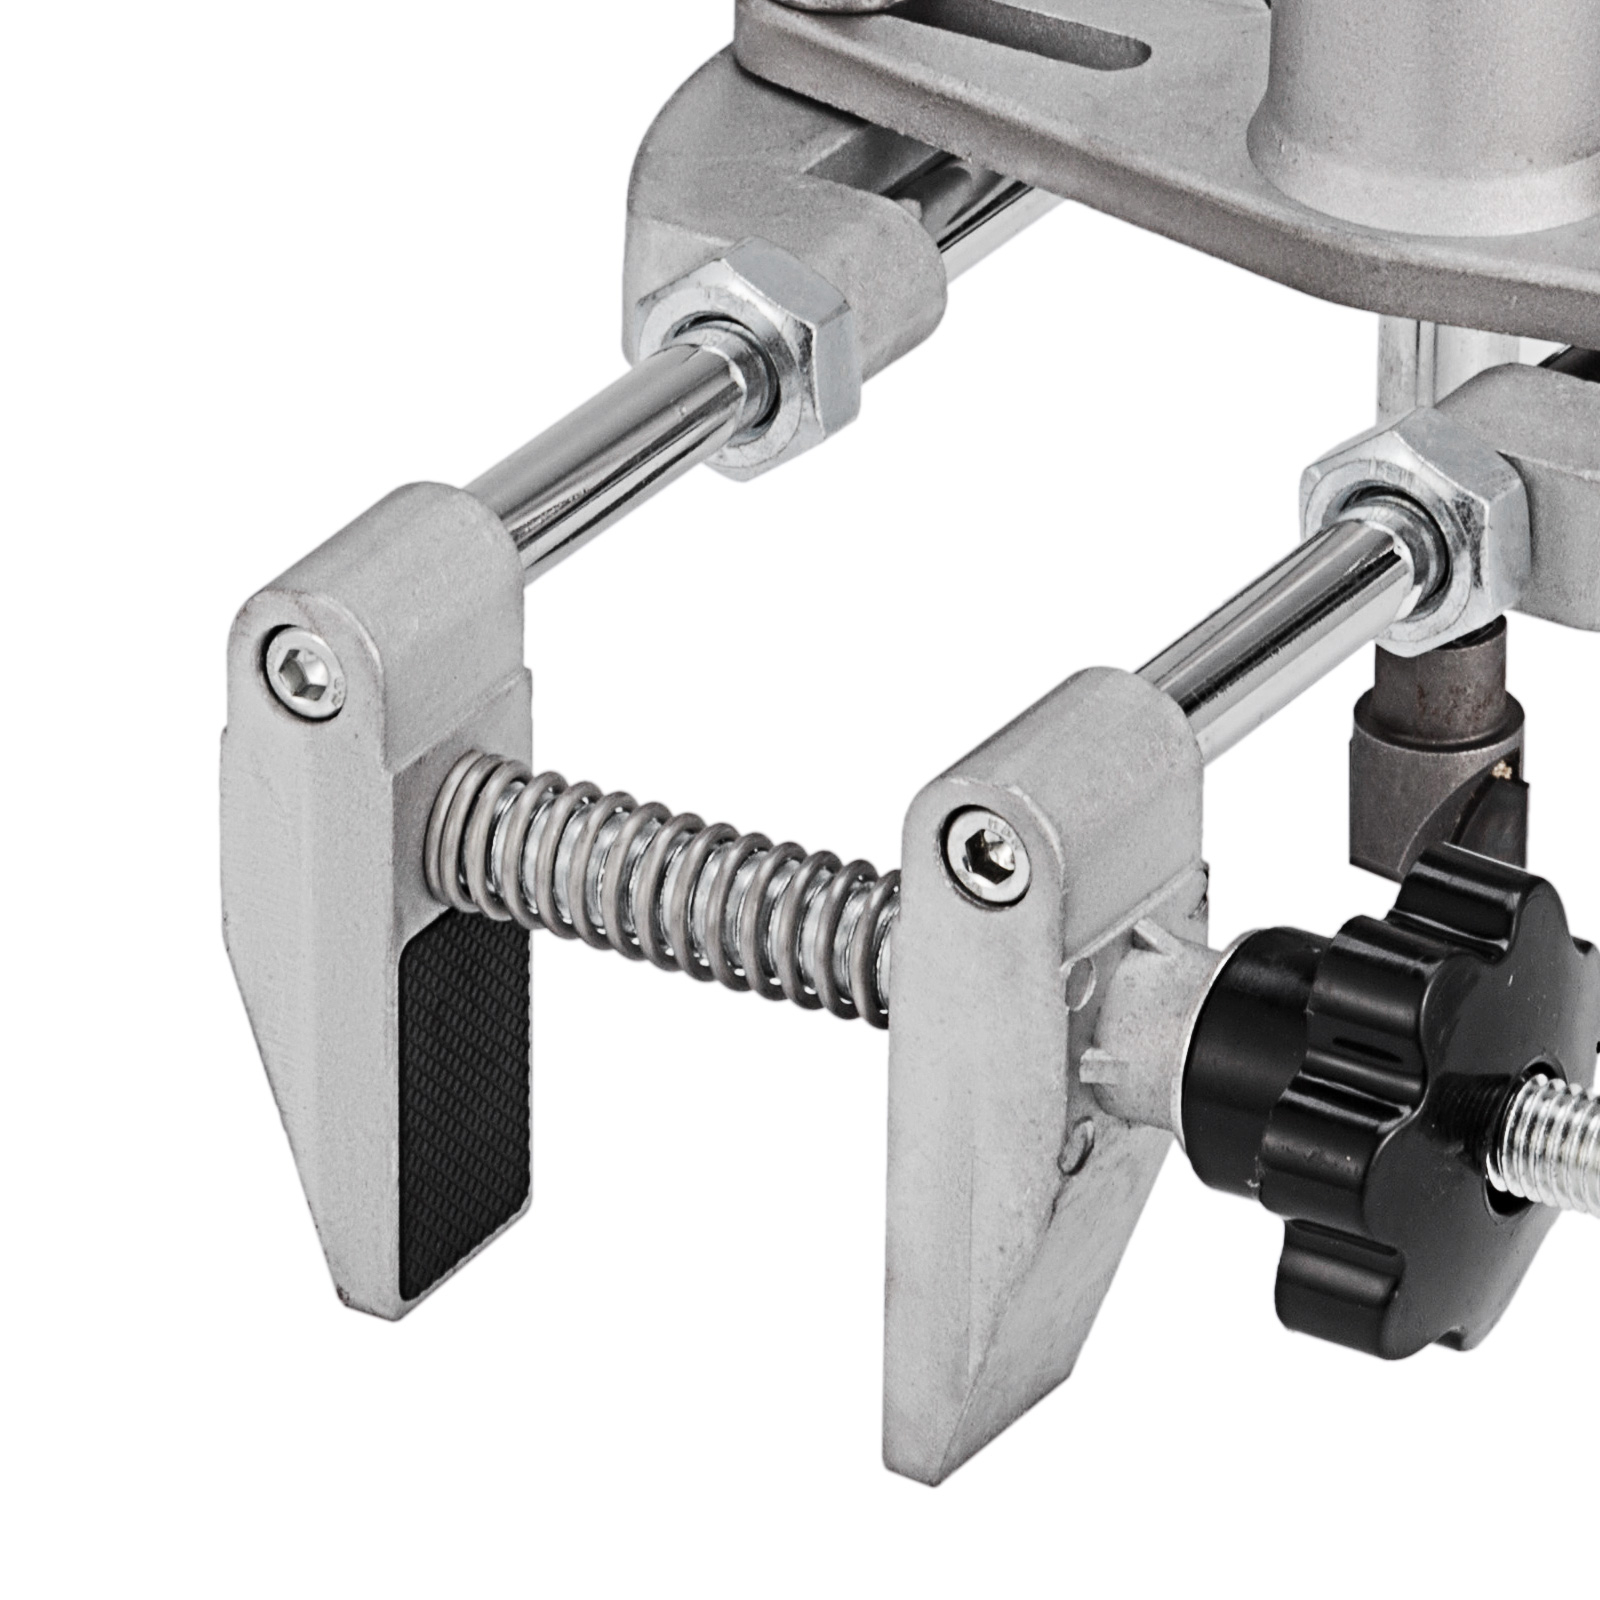 Premium Door Lock Fitting Mortiser Jig Kit Wood Metal Hole Cutter Drill Bit Tool